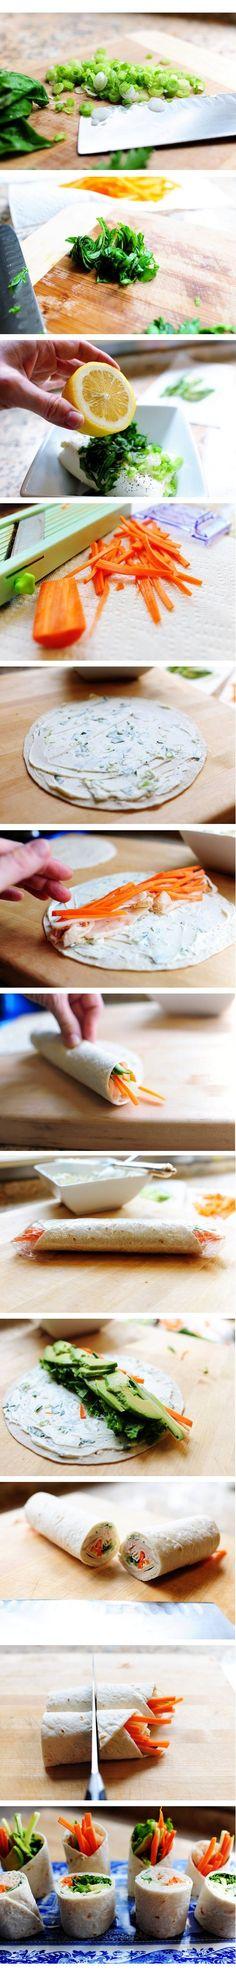 How to Make Tortilla Roll-ups ;)